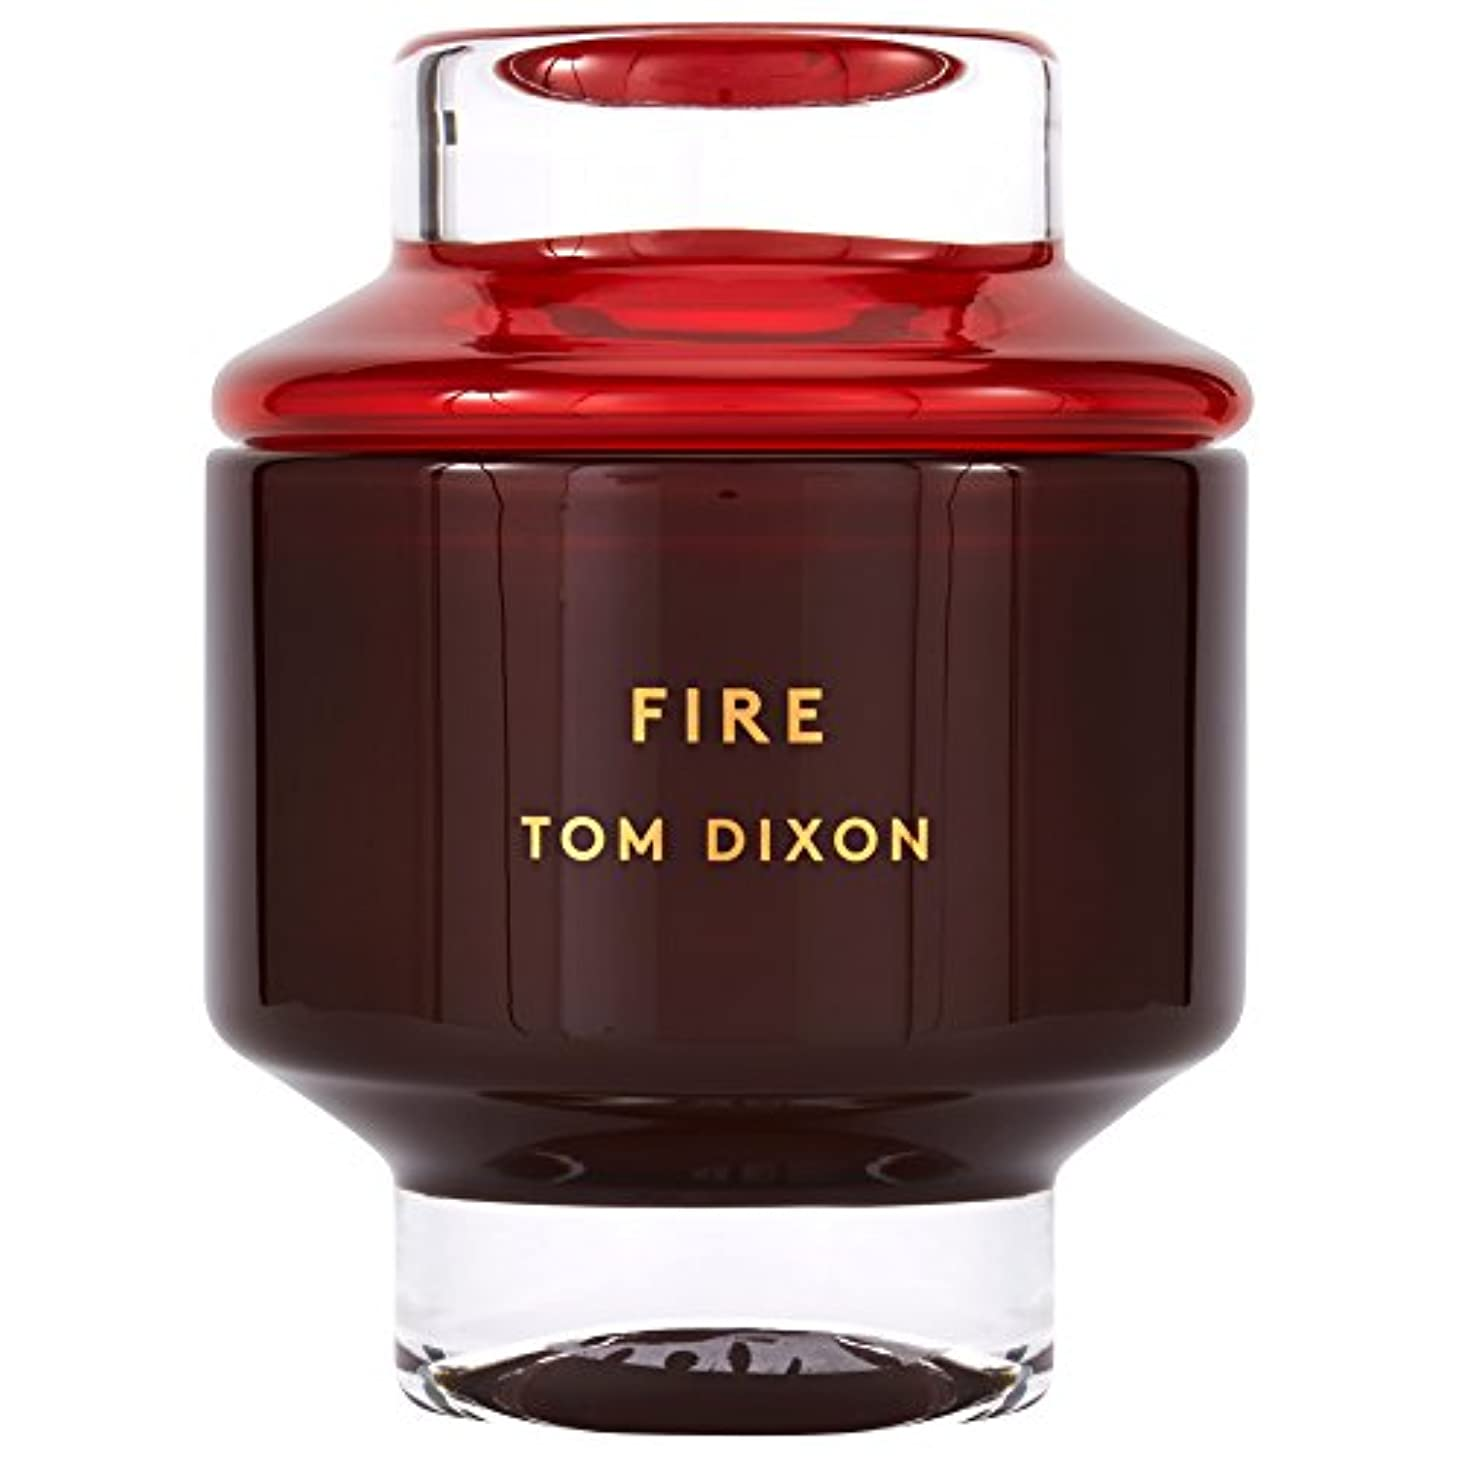 Tom Dixon Fire Scented Candle Large - トム?ディクソン火災大型香りのキャンドル [並行輸入品]